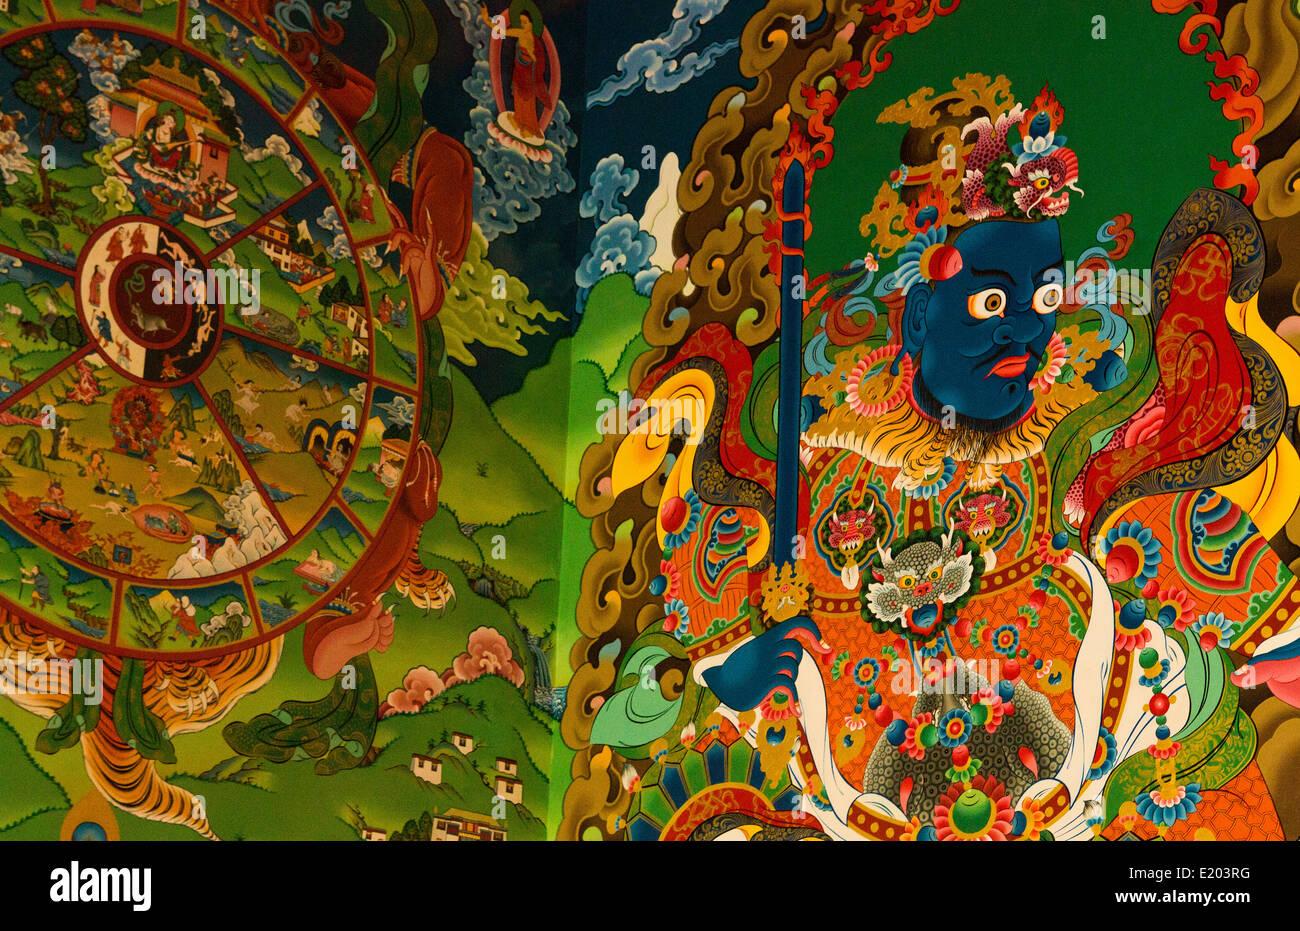 Kathmandu Nepal bunten Illustrationen gemalt an den Wänden des Klosters Drikung Kagyu Rinchenling Stockbild